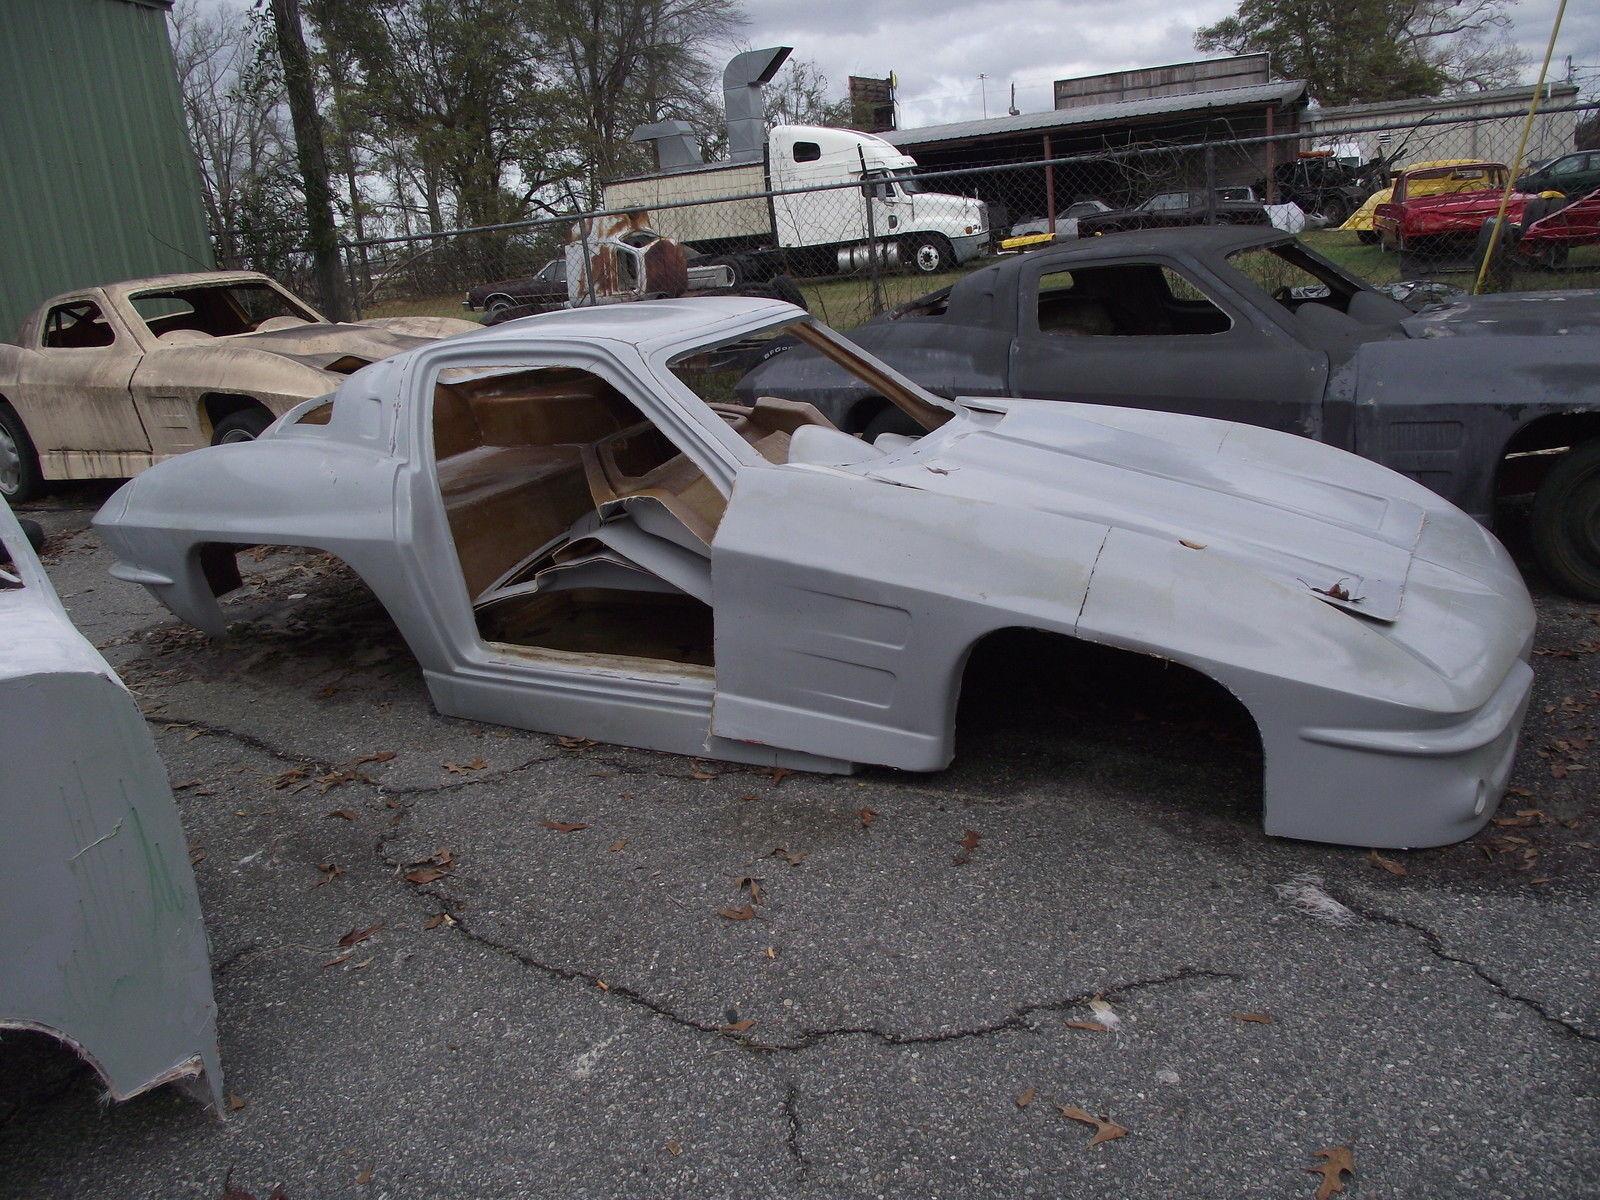 1963 Chev Split Window Corvette Fiberglass Replica Body